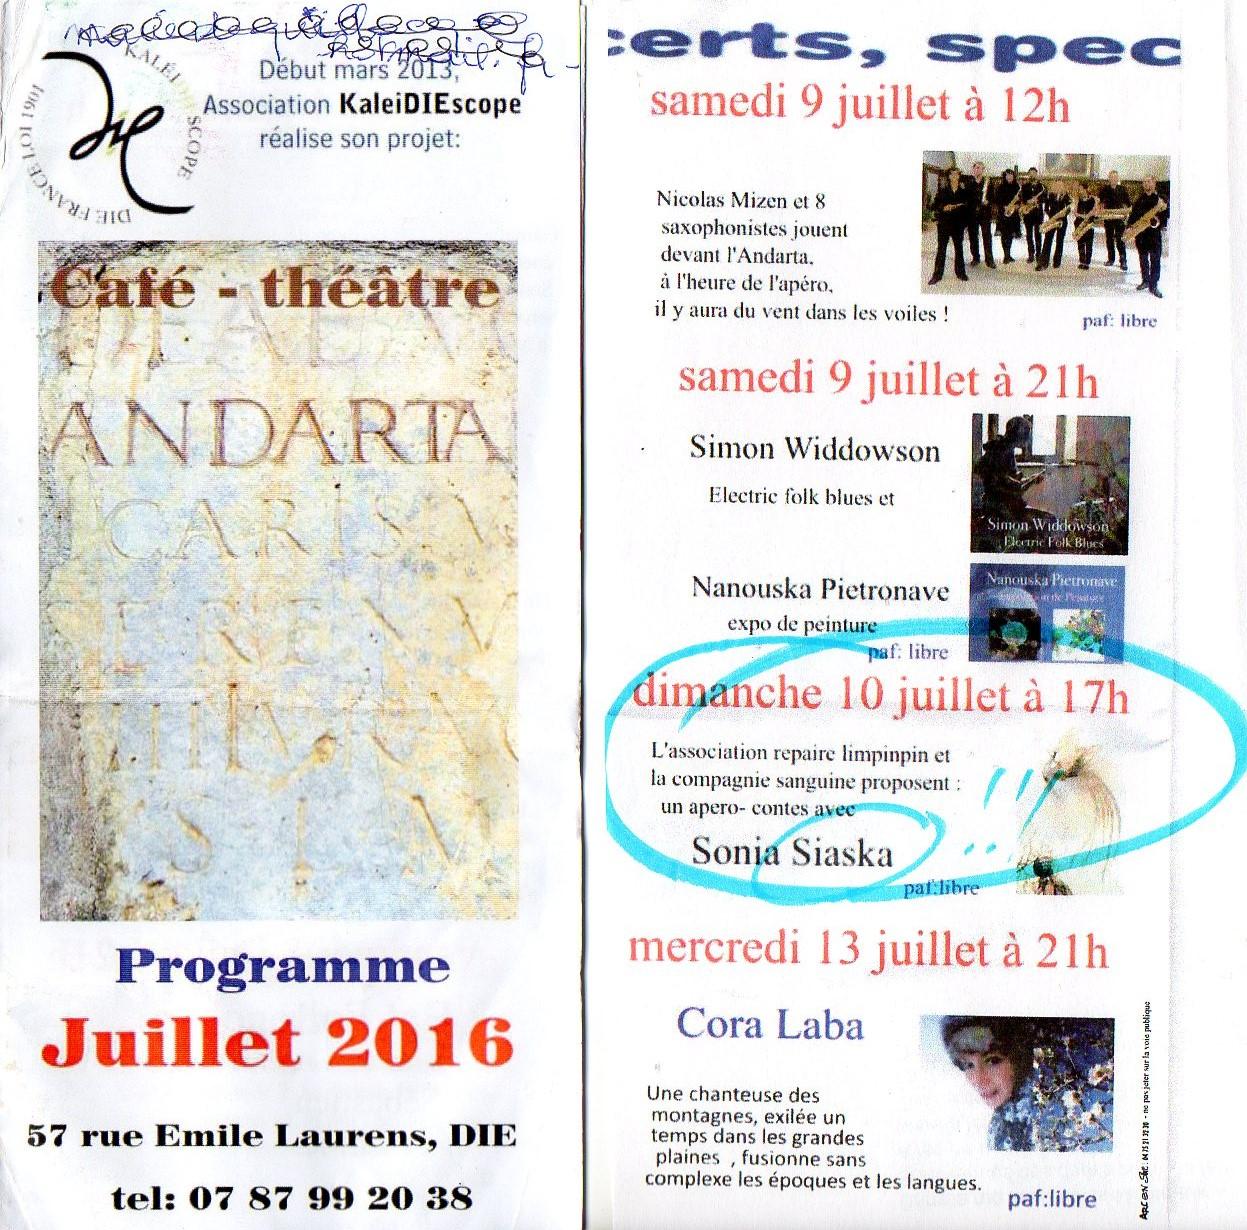 Programme de l'Andarta, à quelques erreurs près...